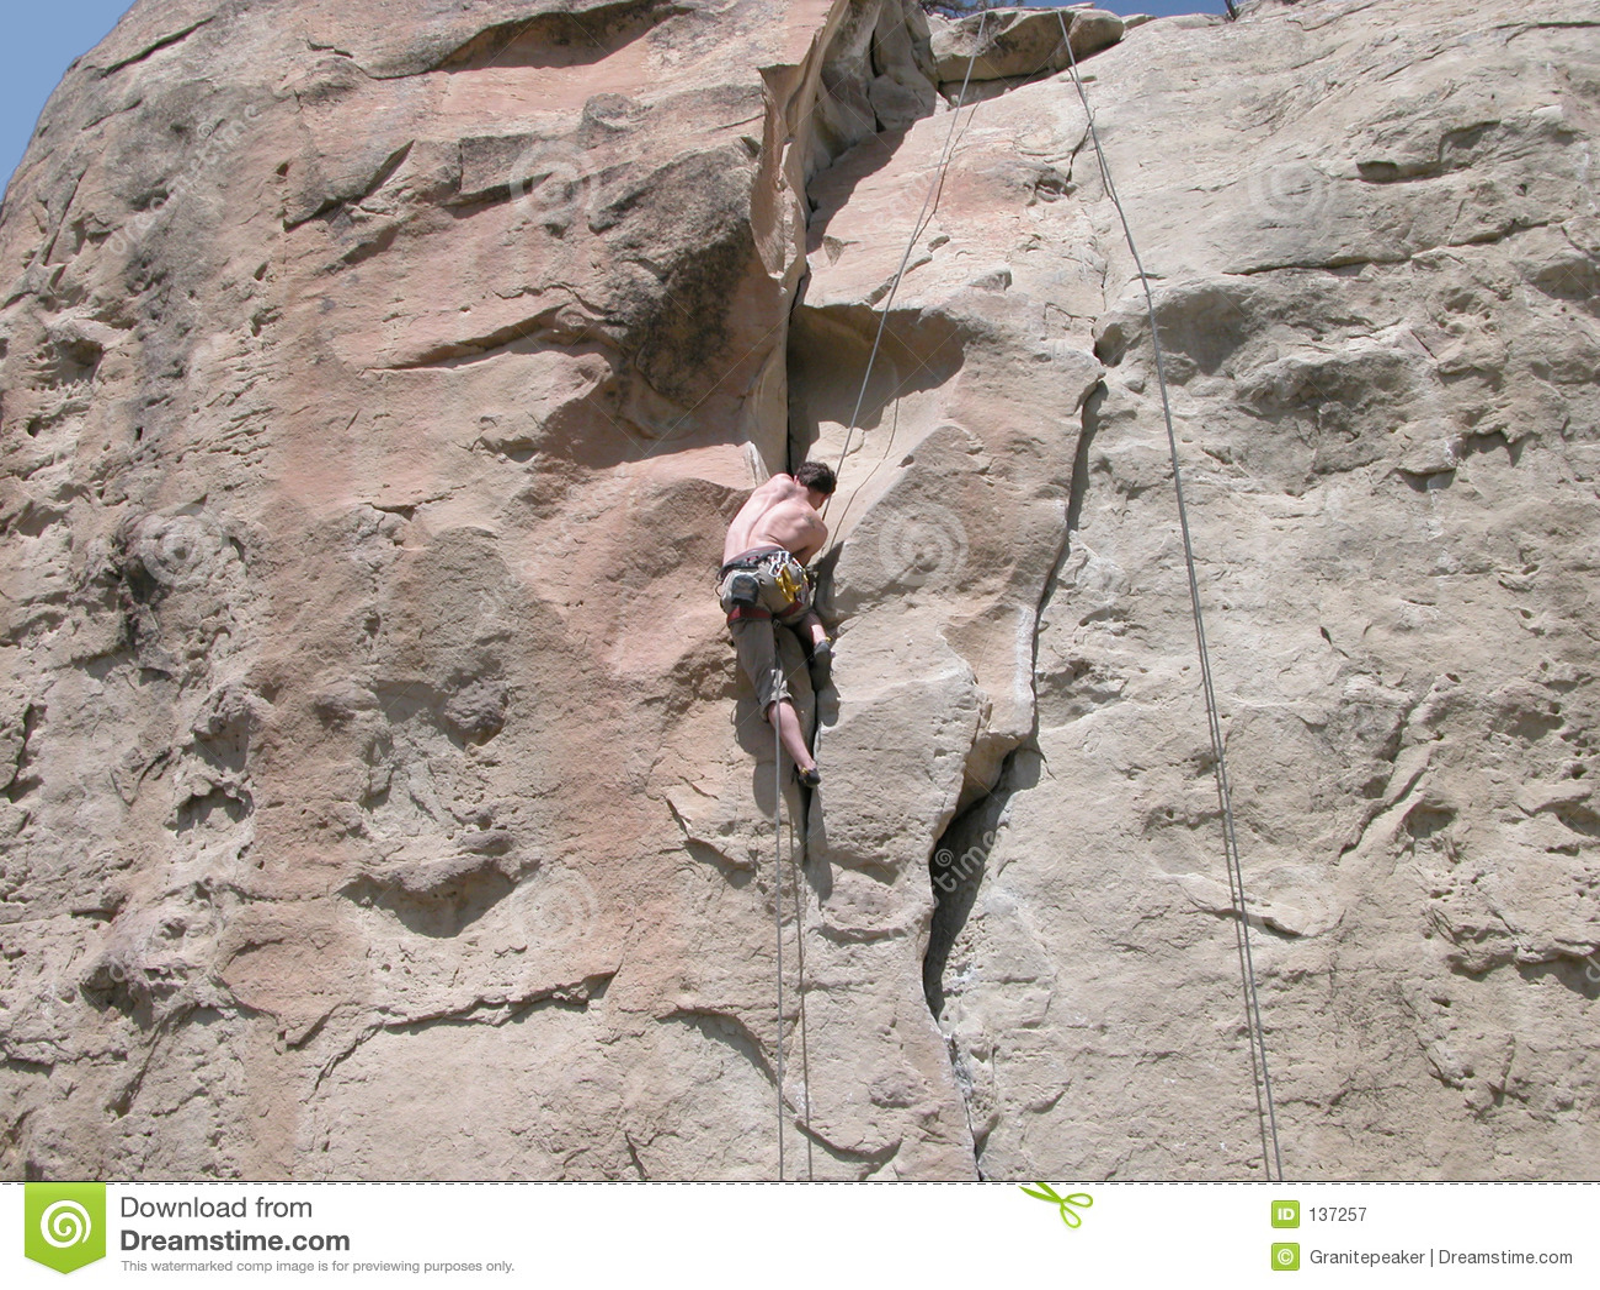 Climbing the Rock Wall